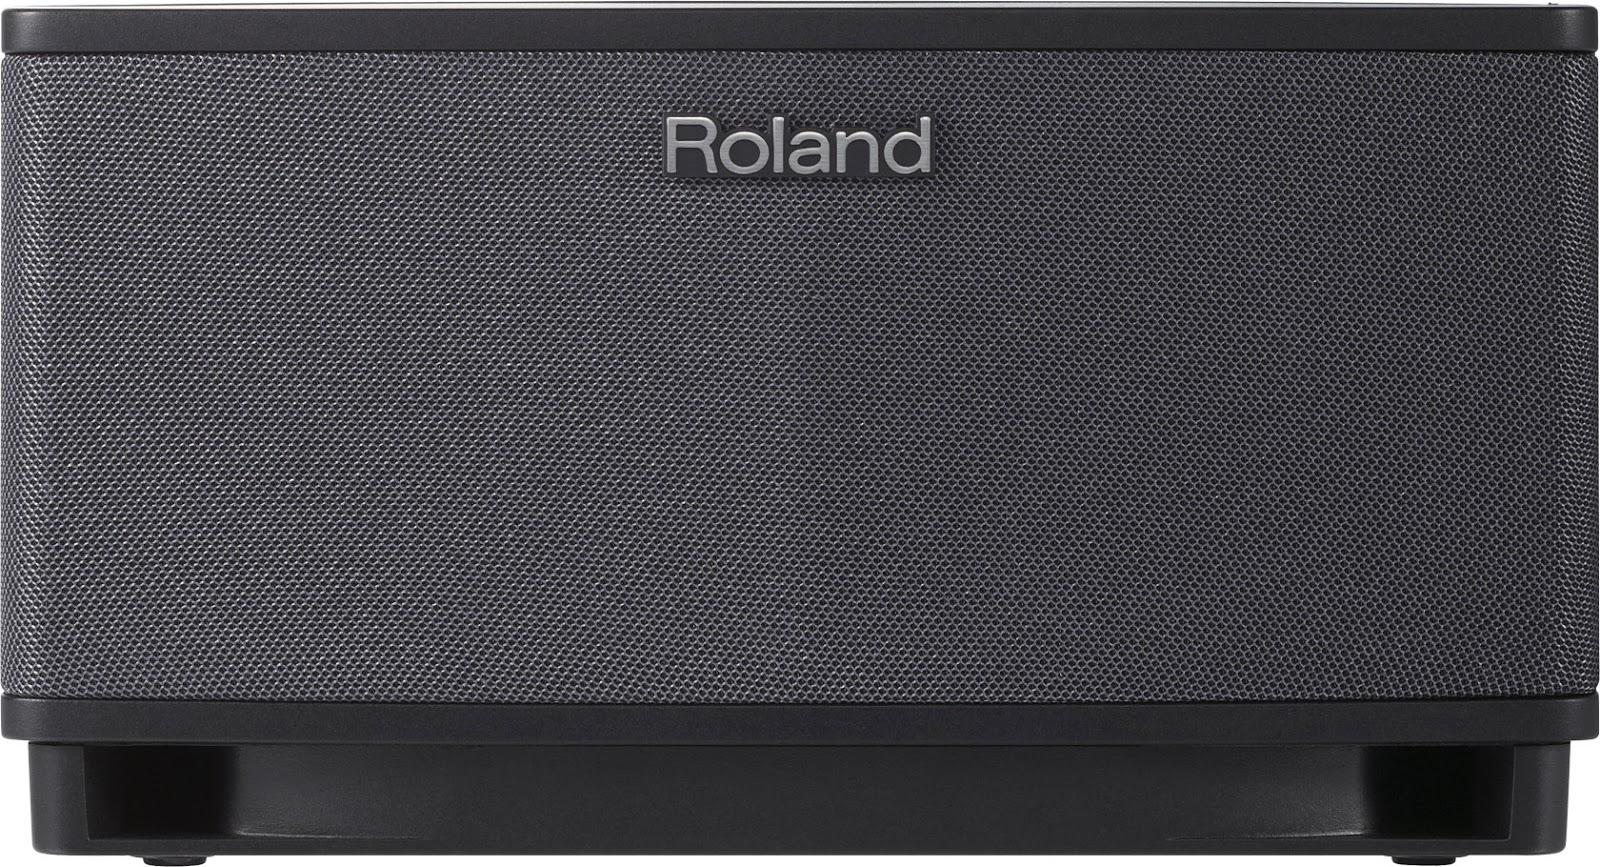 Bộ Loa Combo Roland Cube lite guitar giá rẻ tại tphcm